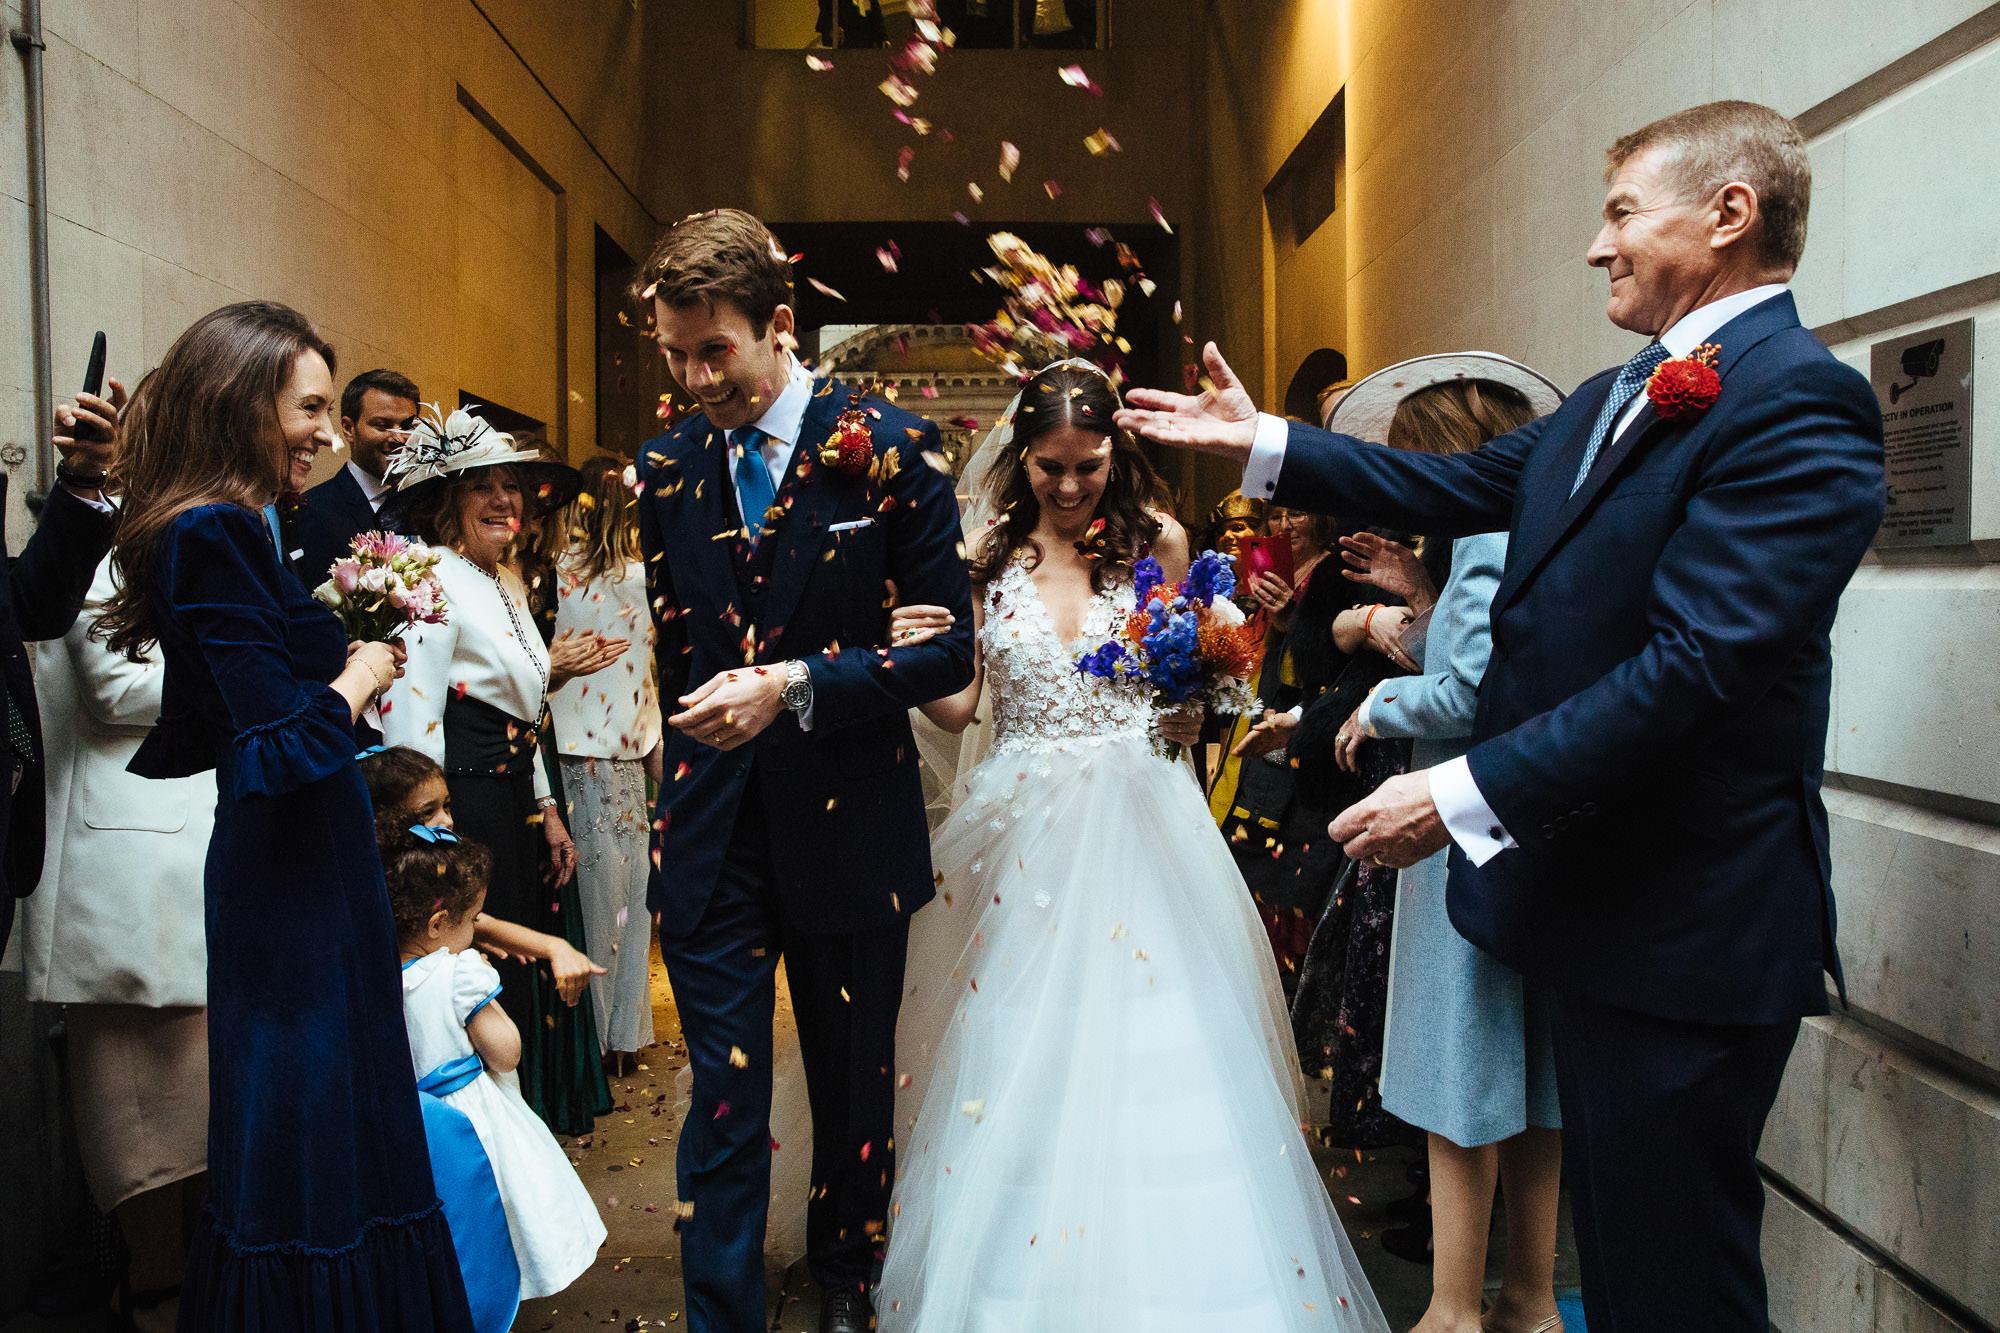 st brides church wedding